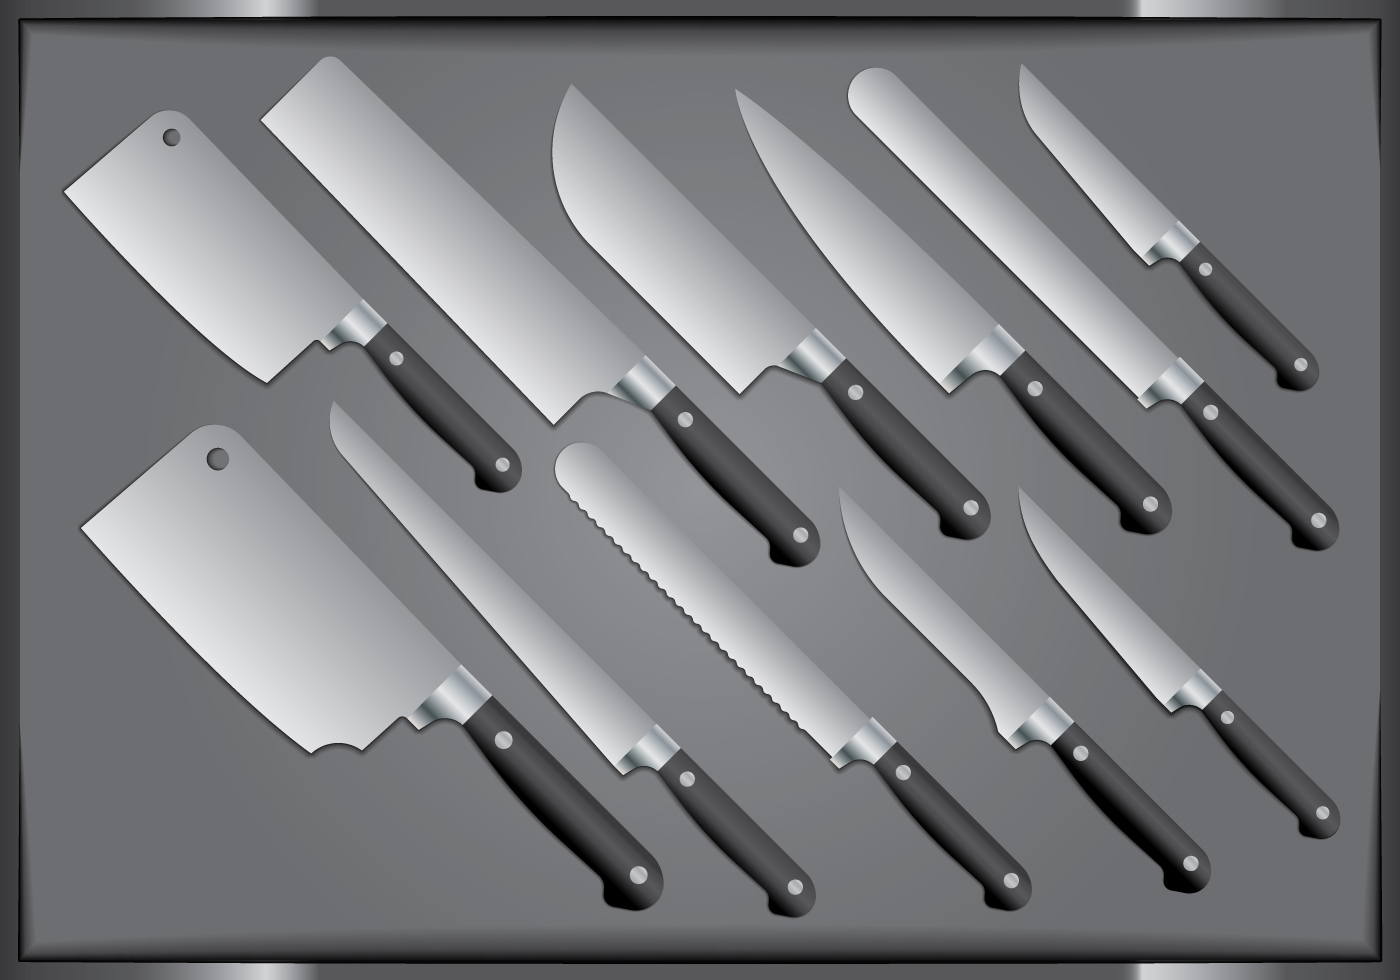 Kitchen Tools Free Vector Art